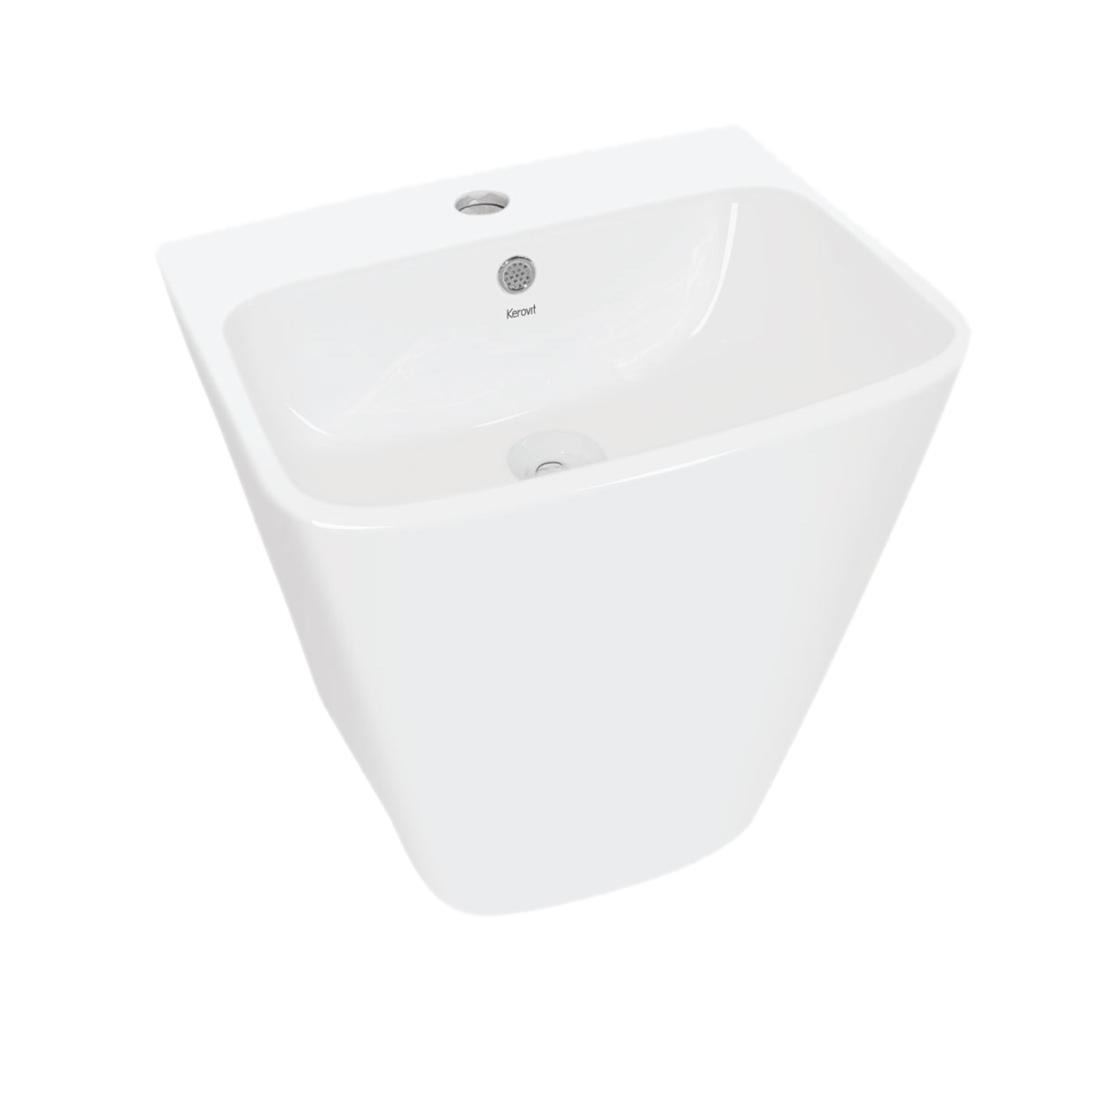 Kerovit Alba KB5800 Wash Basin With Integrated Half Pedestal